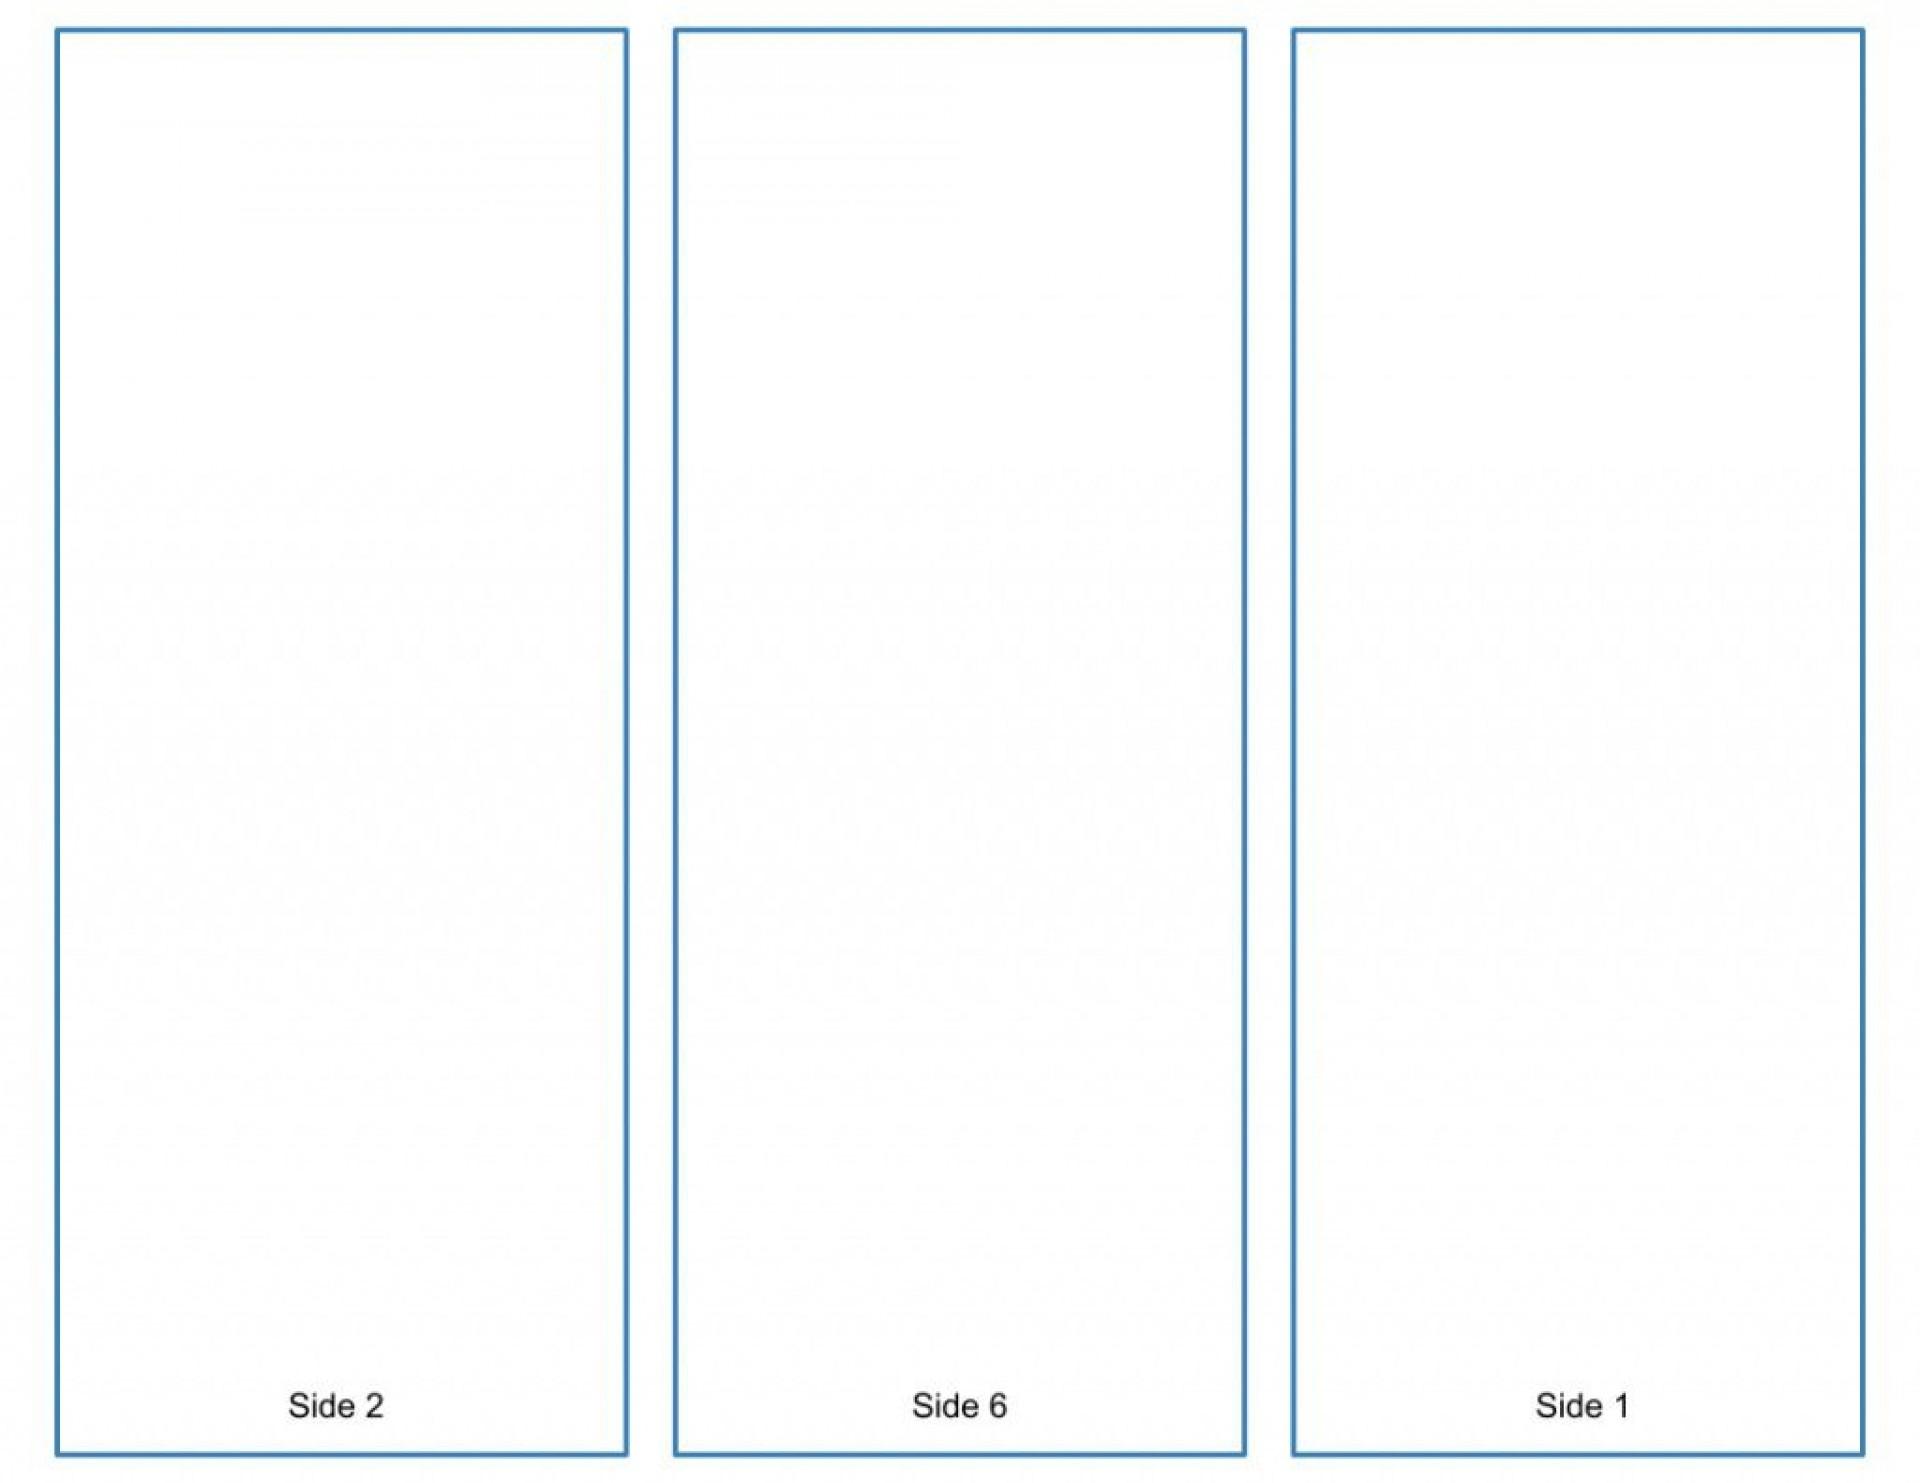 003 Dreaded Brochure Template For Google Doc Photo  Docs Free 3 Panel Tri Fold1920